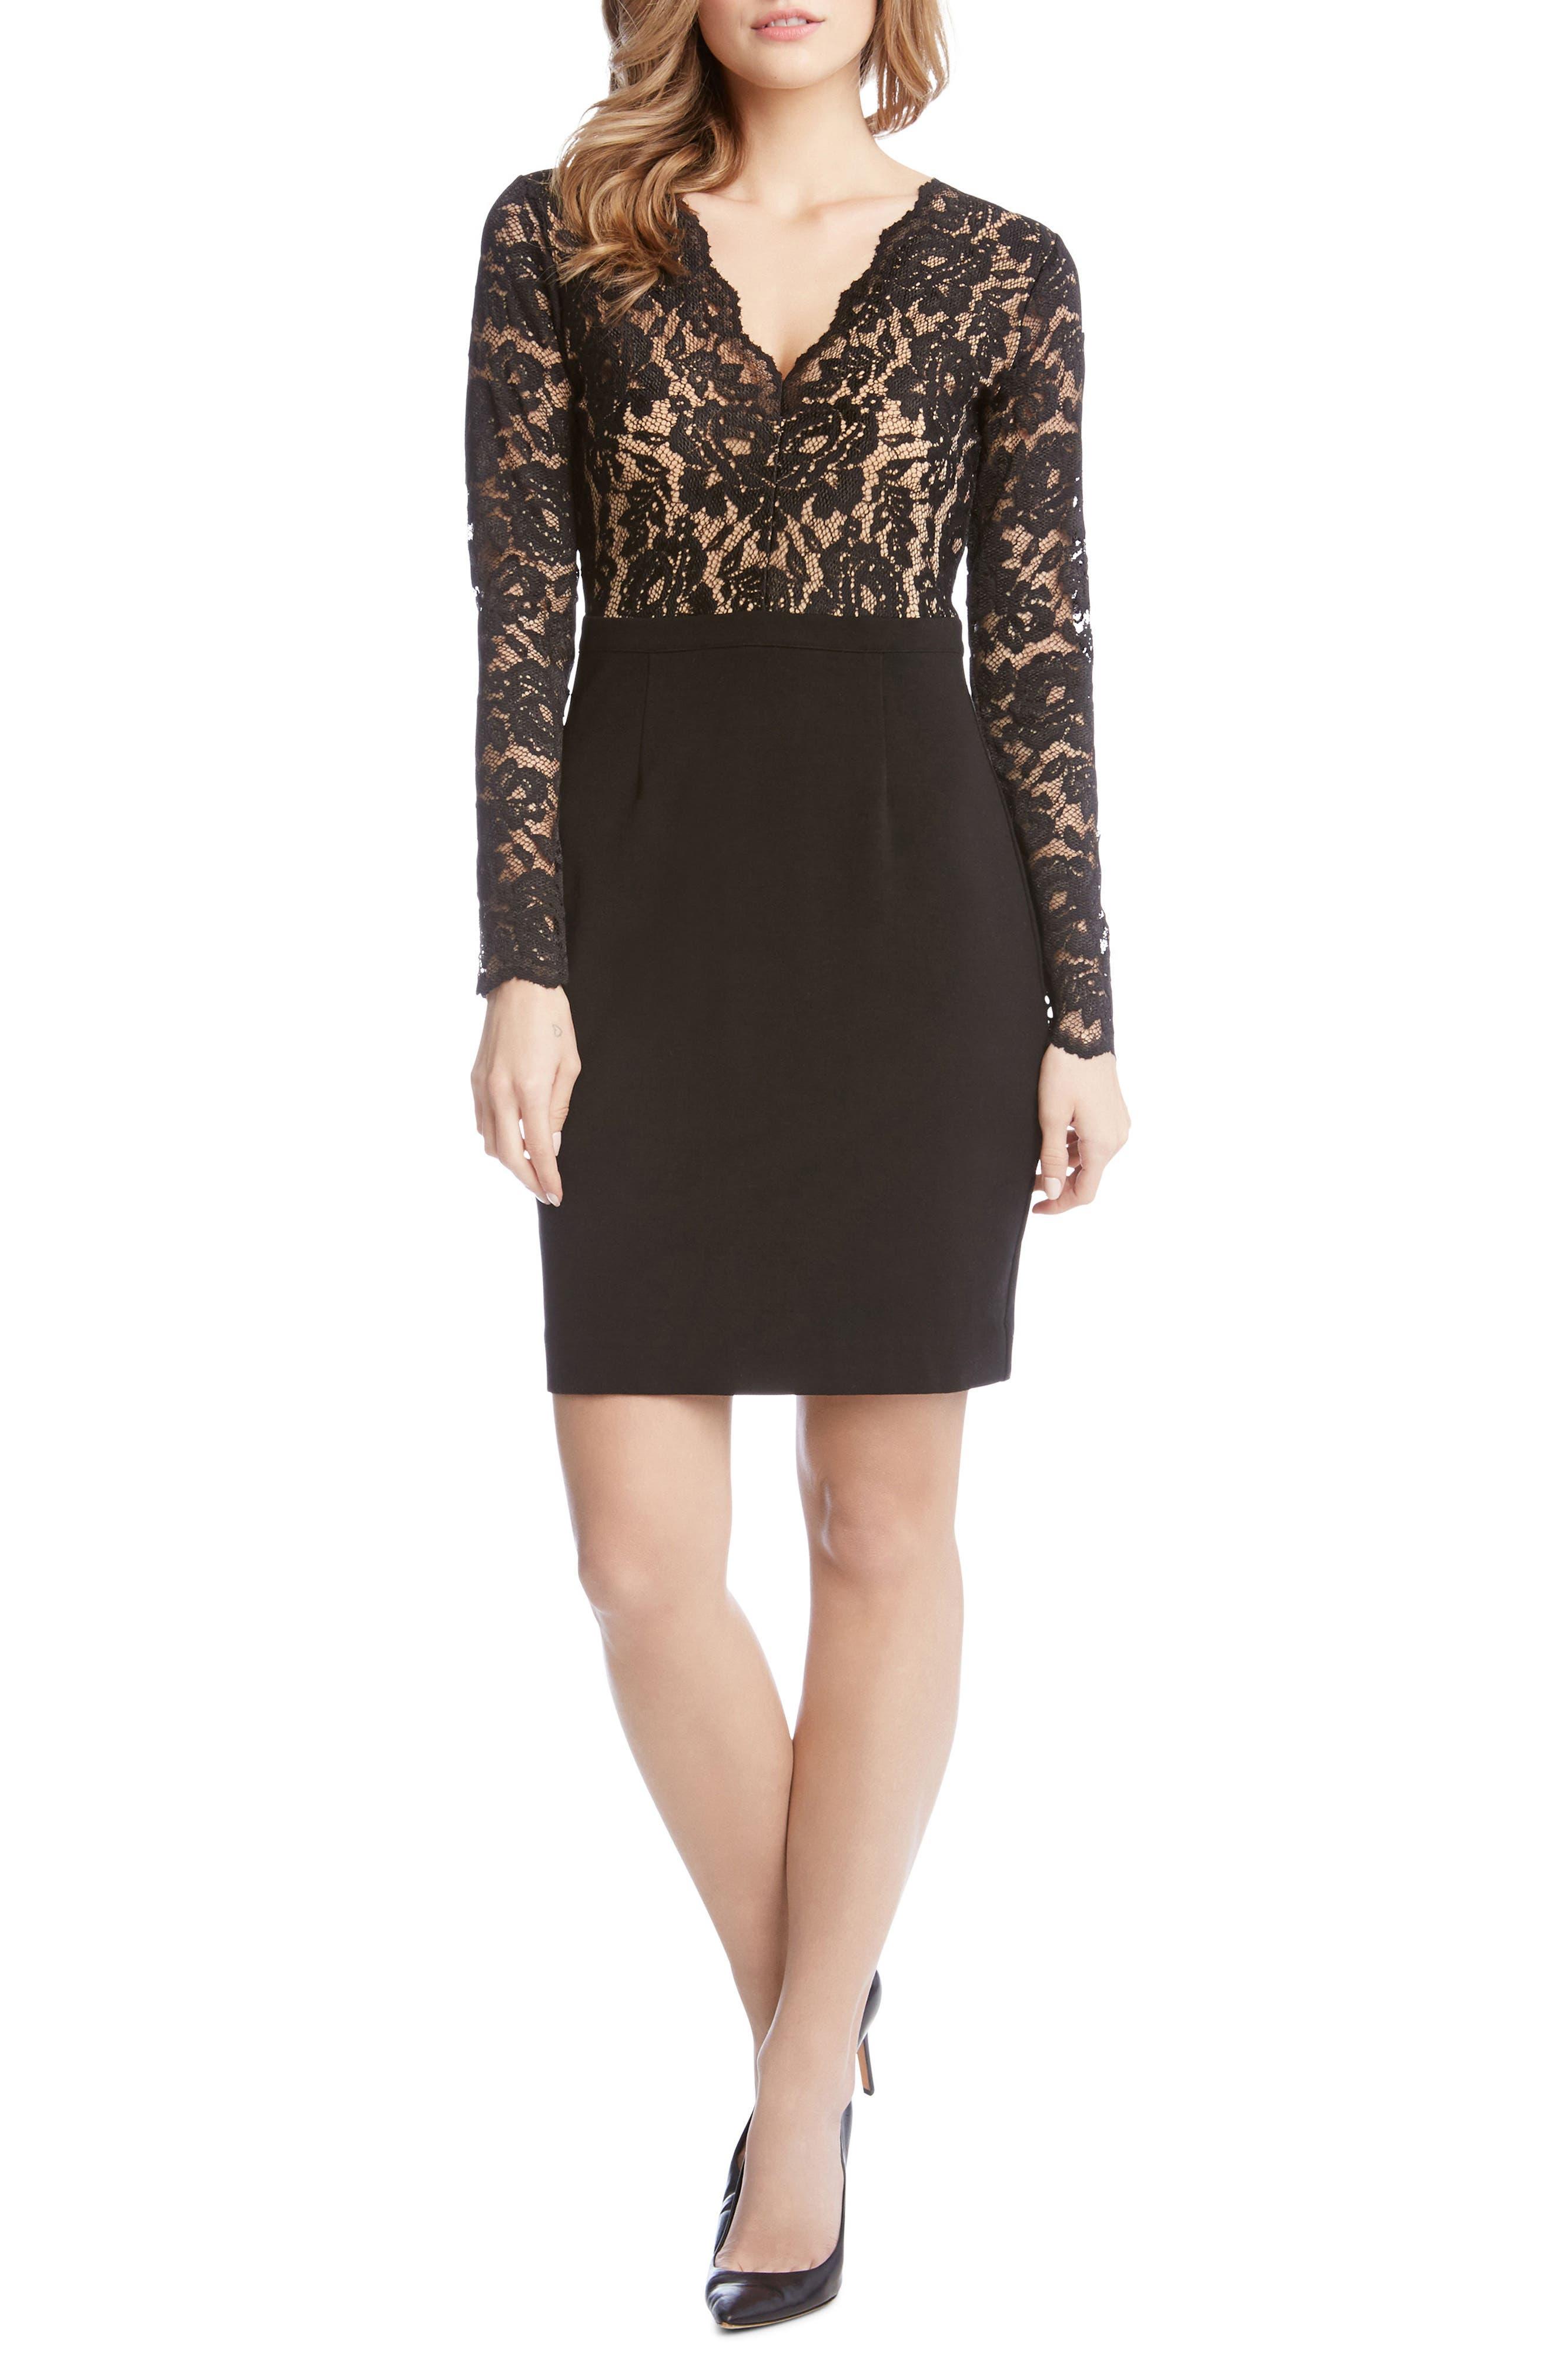 Main Image - Karen Kane Becca Lace & Knit Sheath Dress